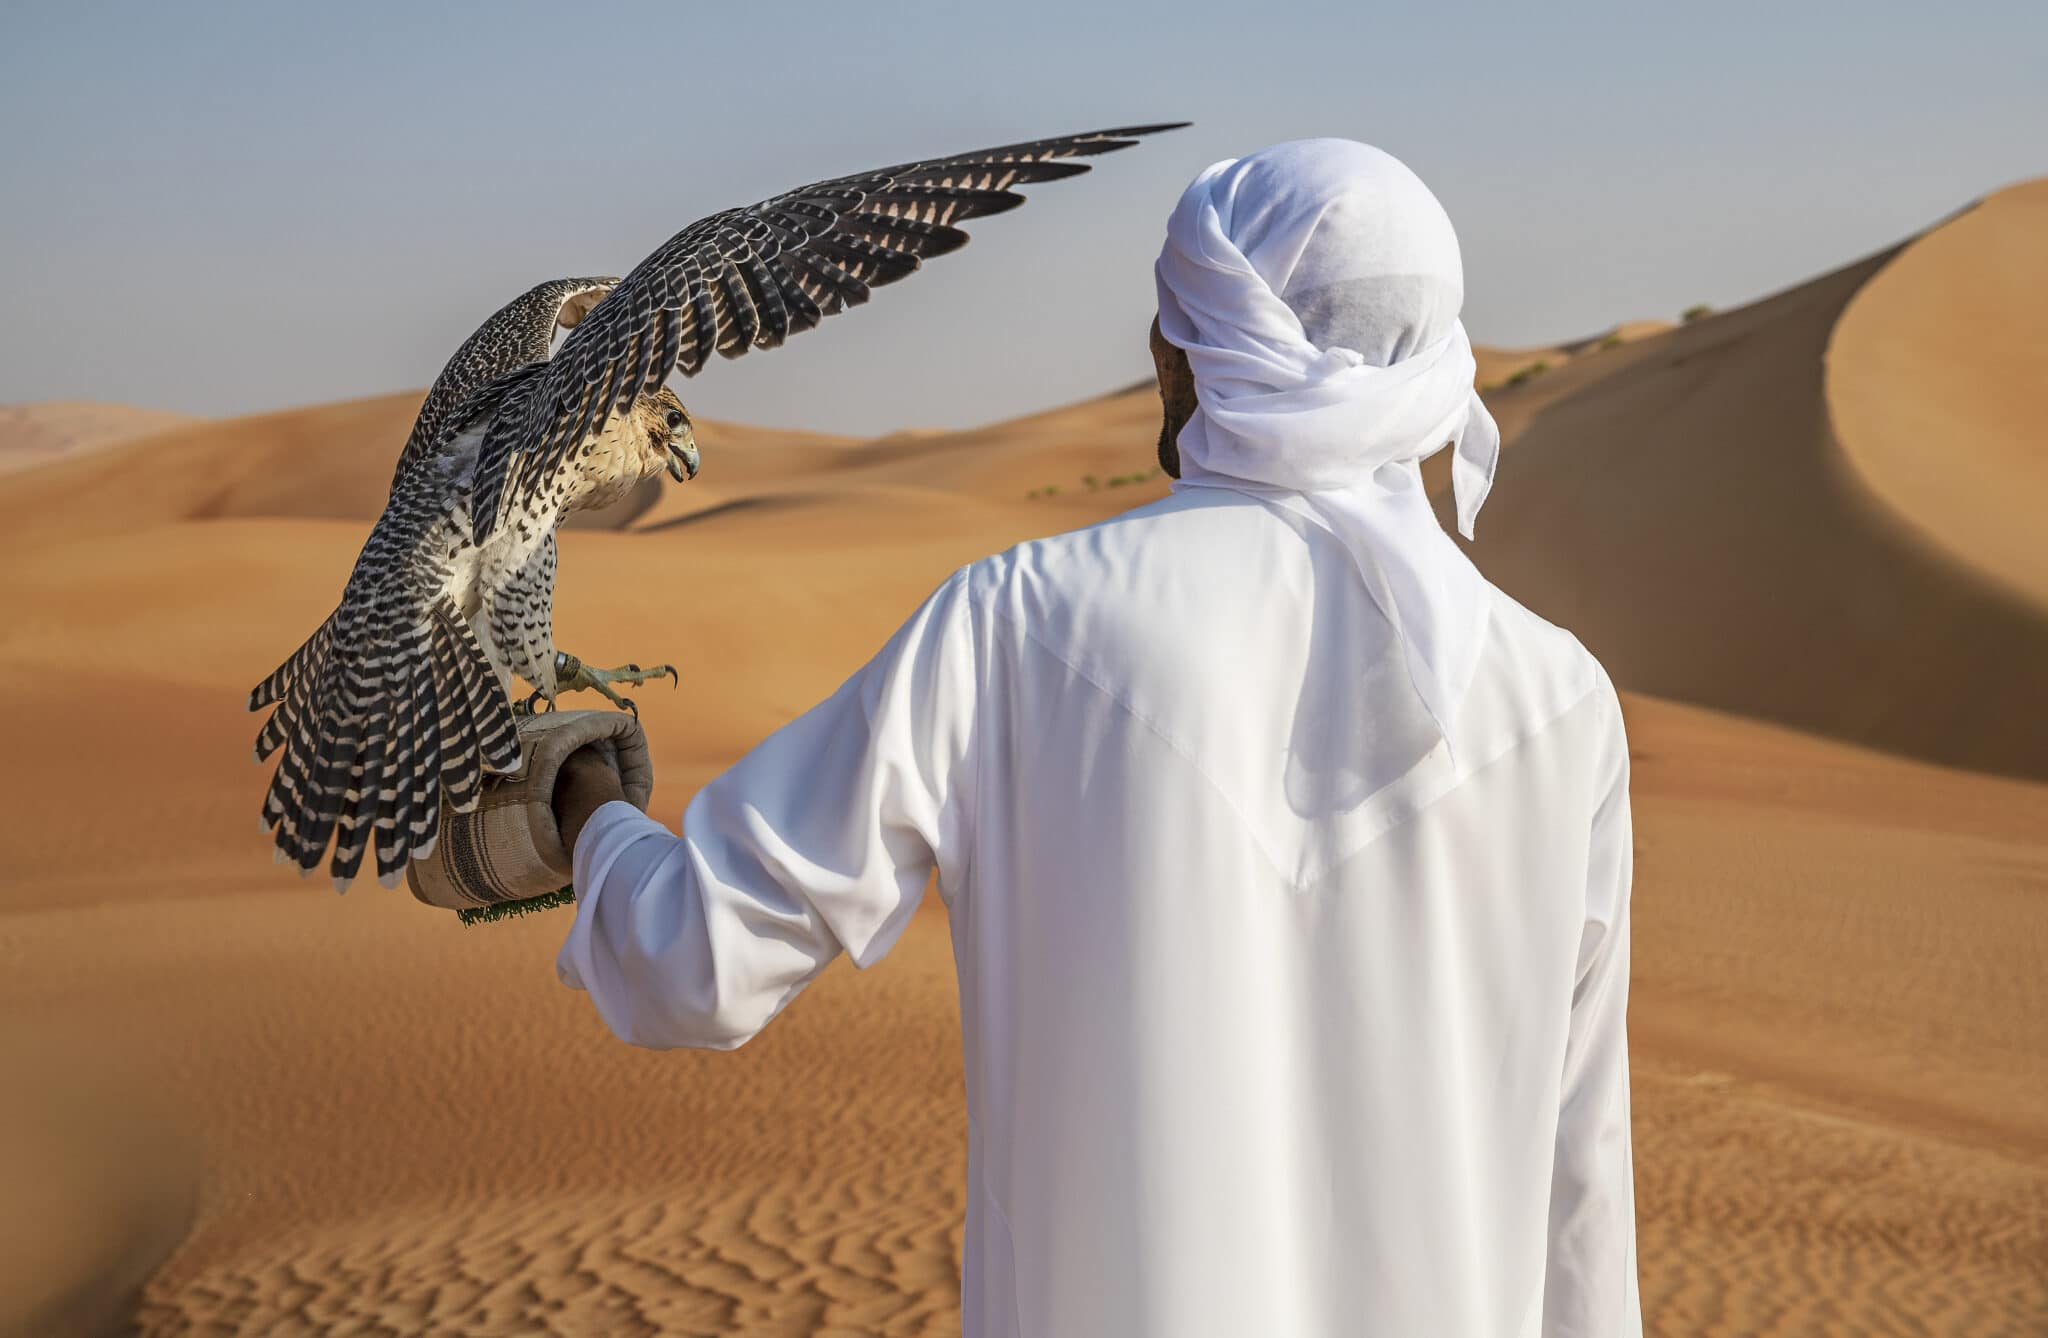 Carrousel 12 Qasr_Al_Sarab_Desert_Resort_by_Anantara_Recreation_Activities_Falcon_Show_Falconer